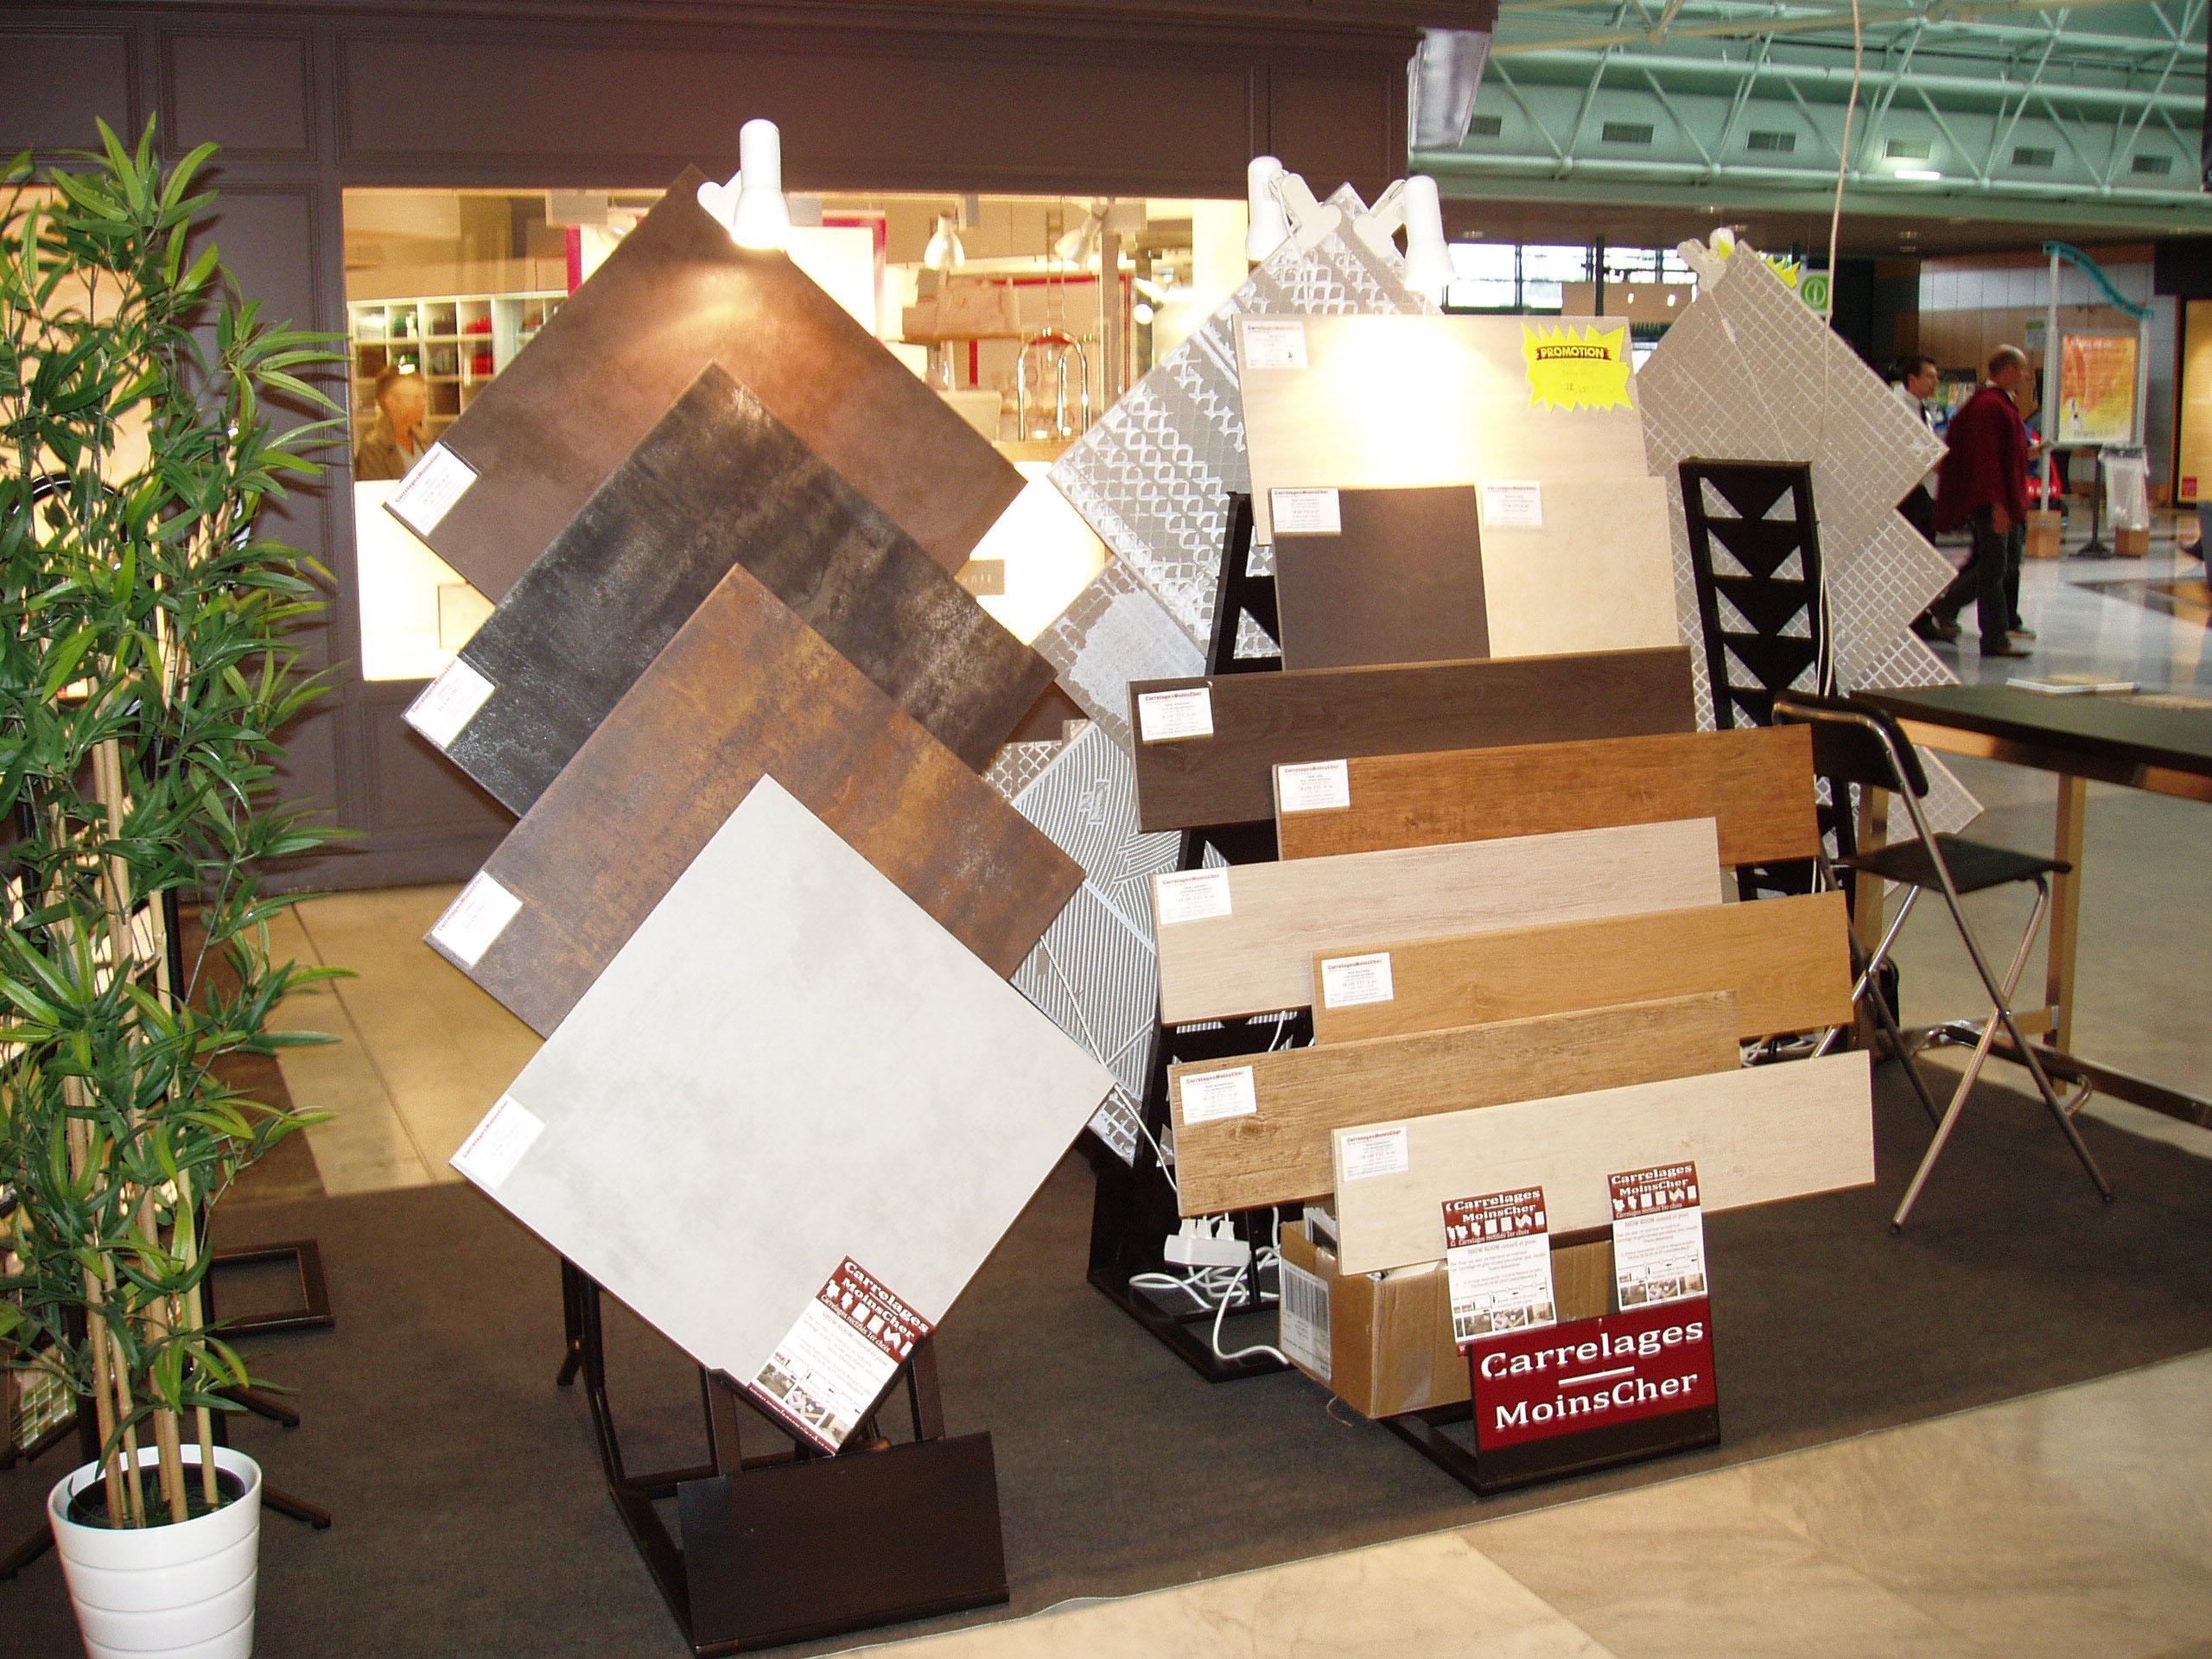 coordonn es des magasins de carrelage carrelagesmoinscher des magasins partout en france. Black Bedroom Furniture Sets. Home Design Ideas